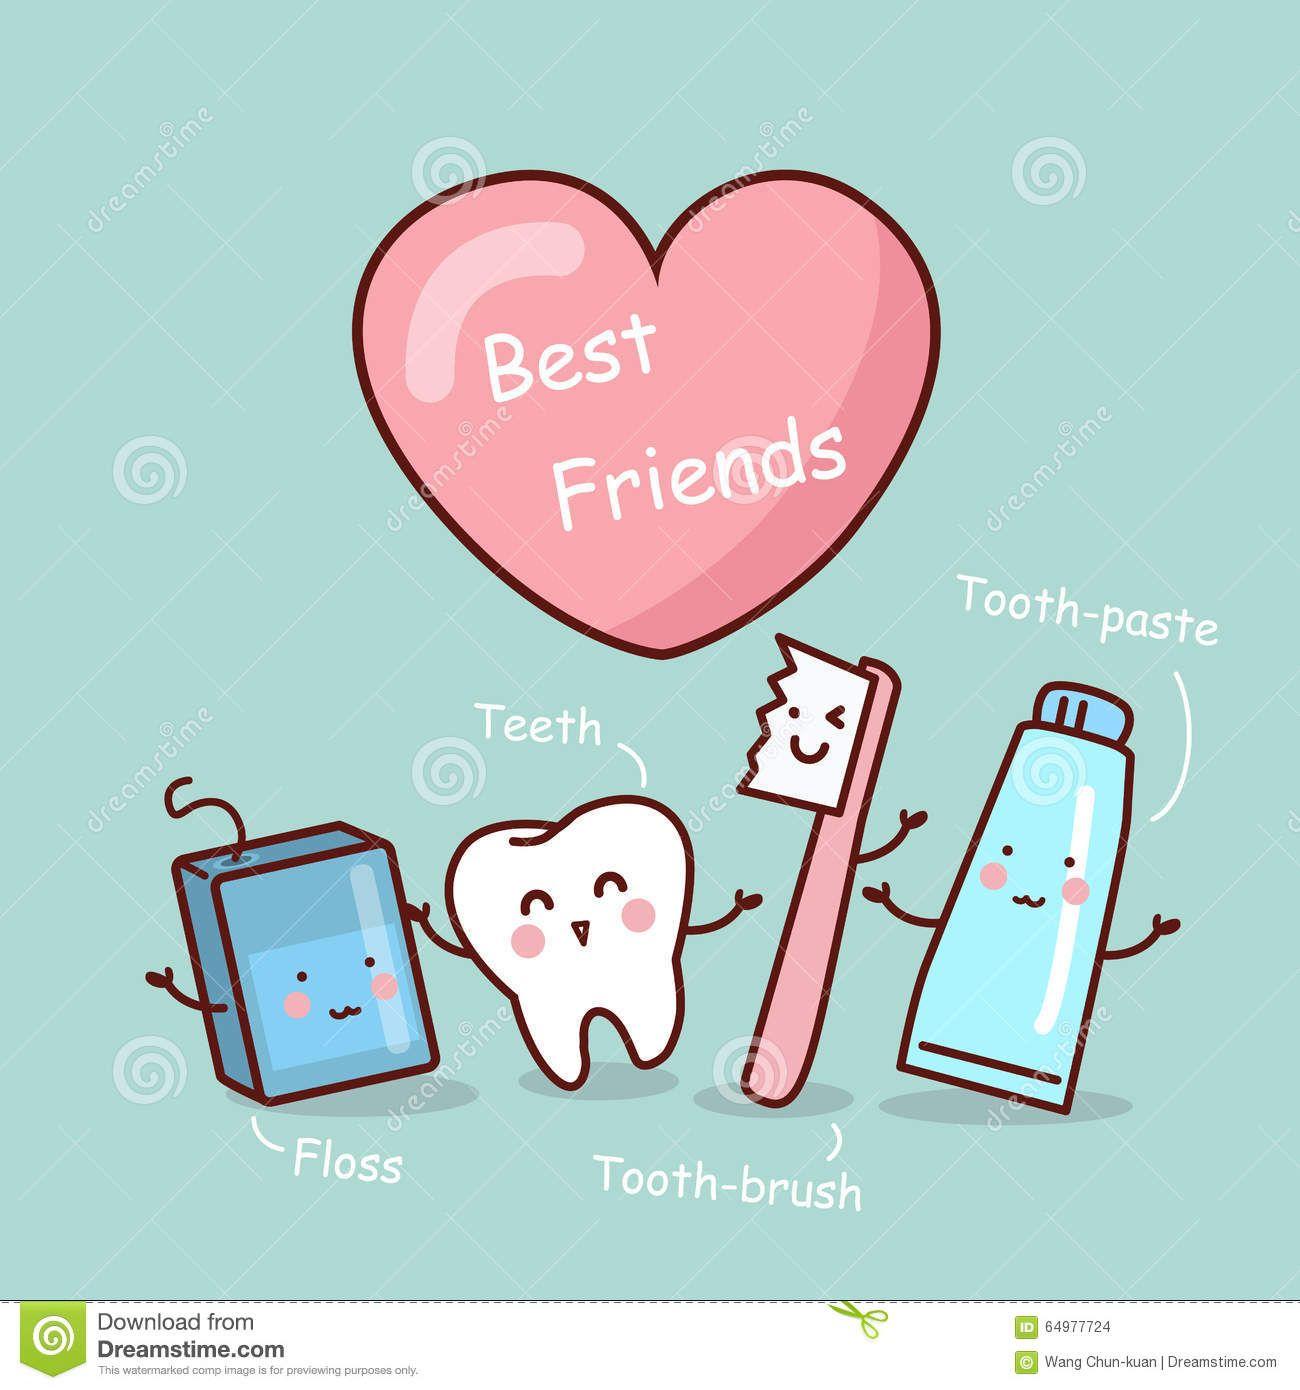 Pin by Bosbos Osama on Dental Brushing teeth